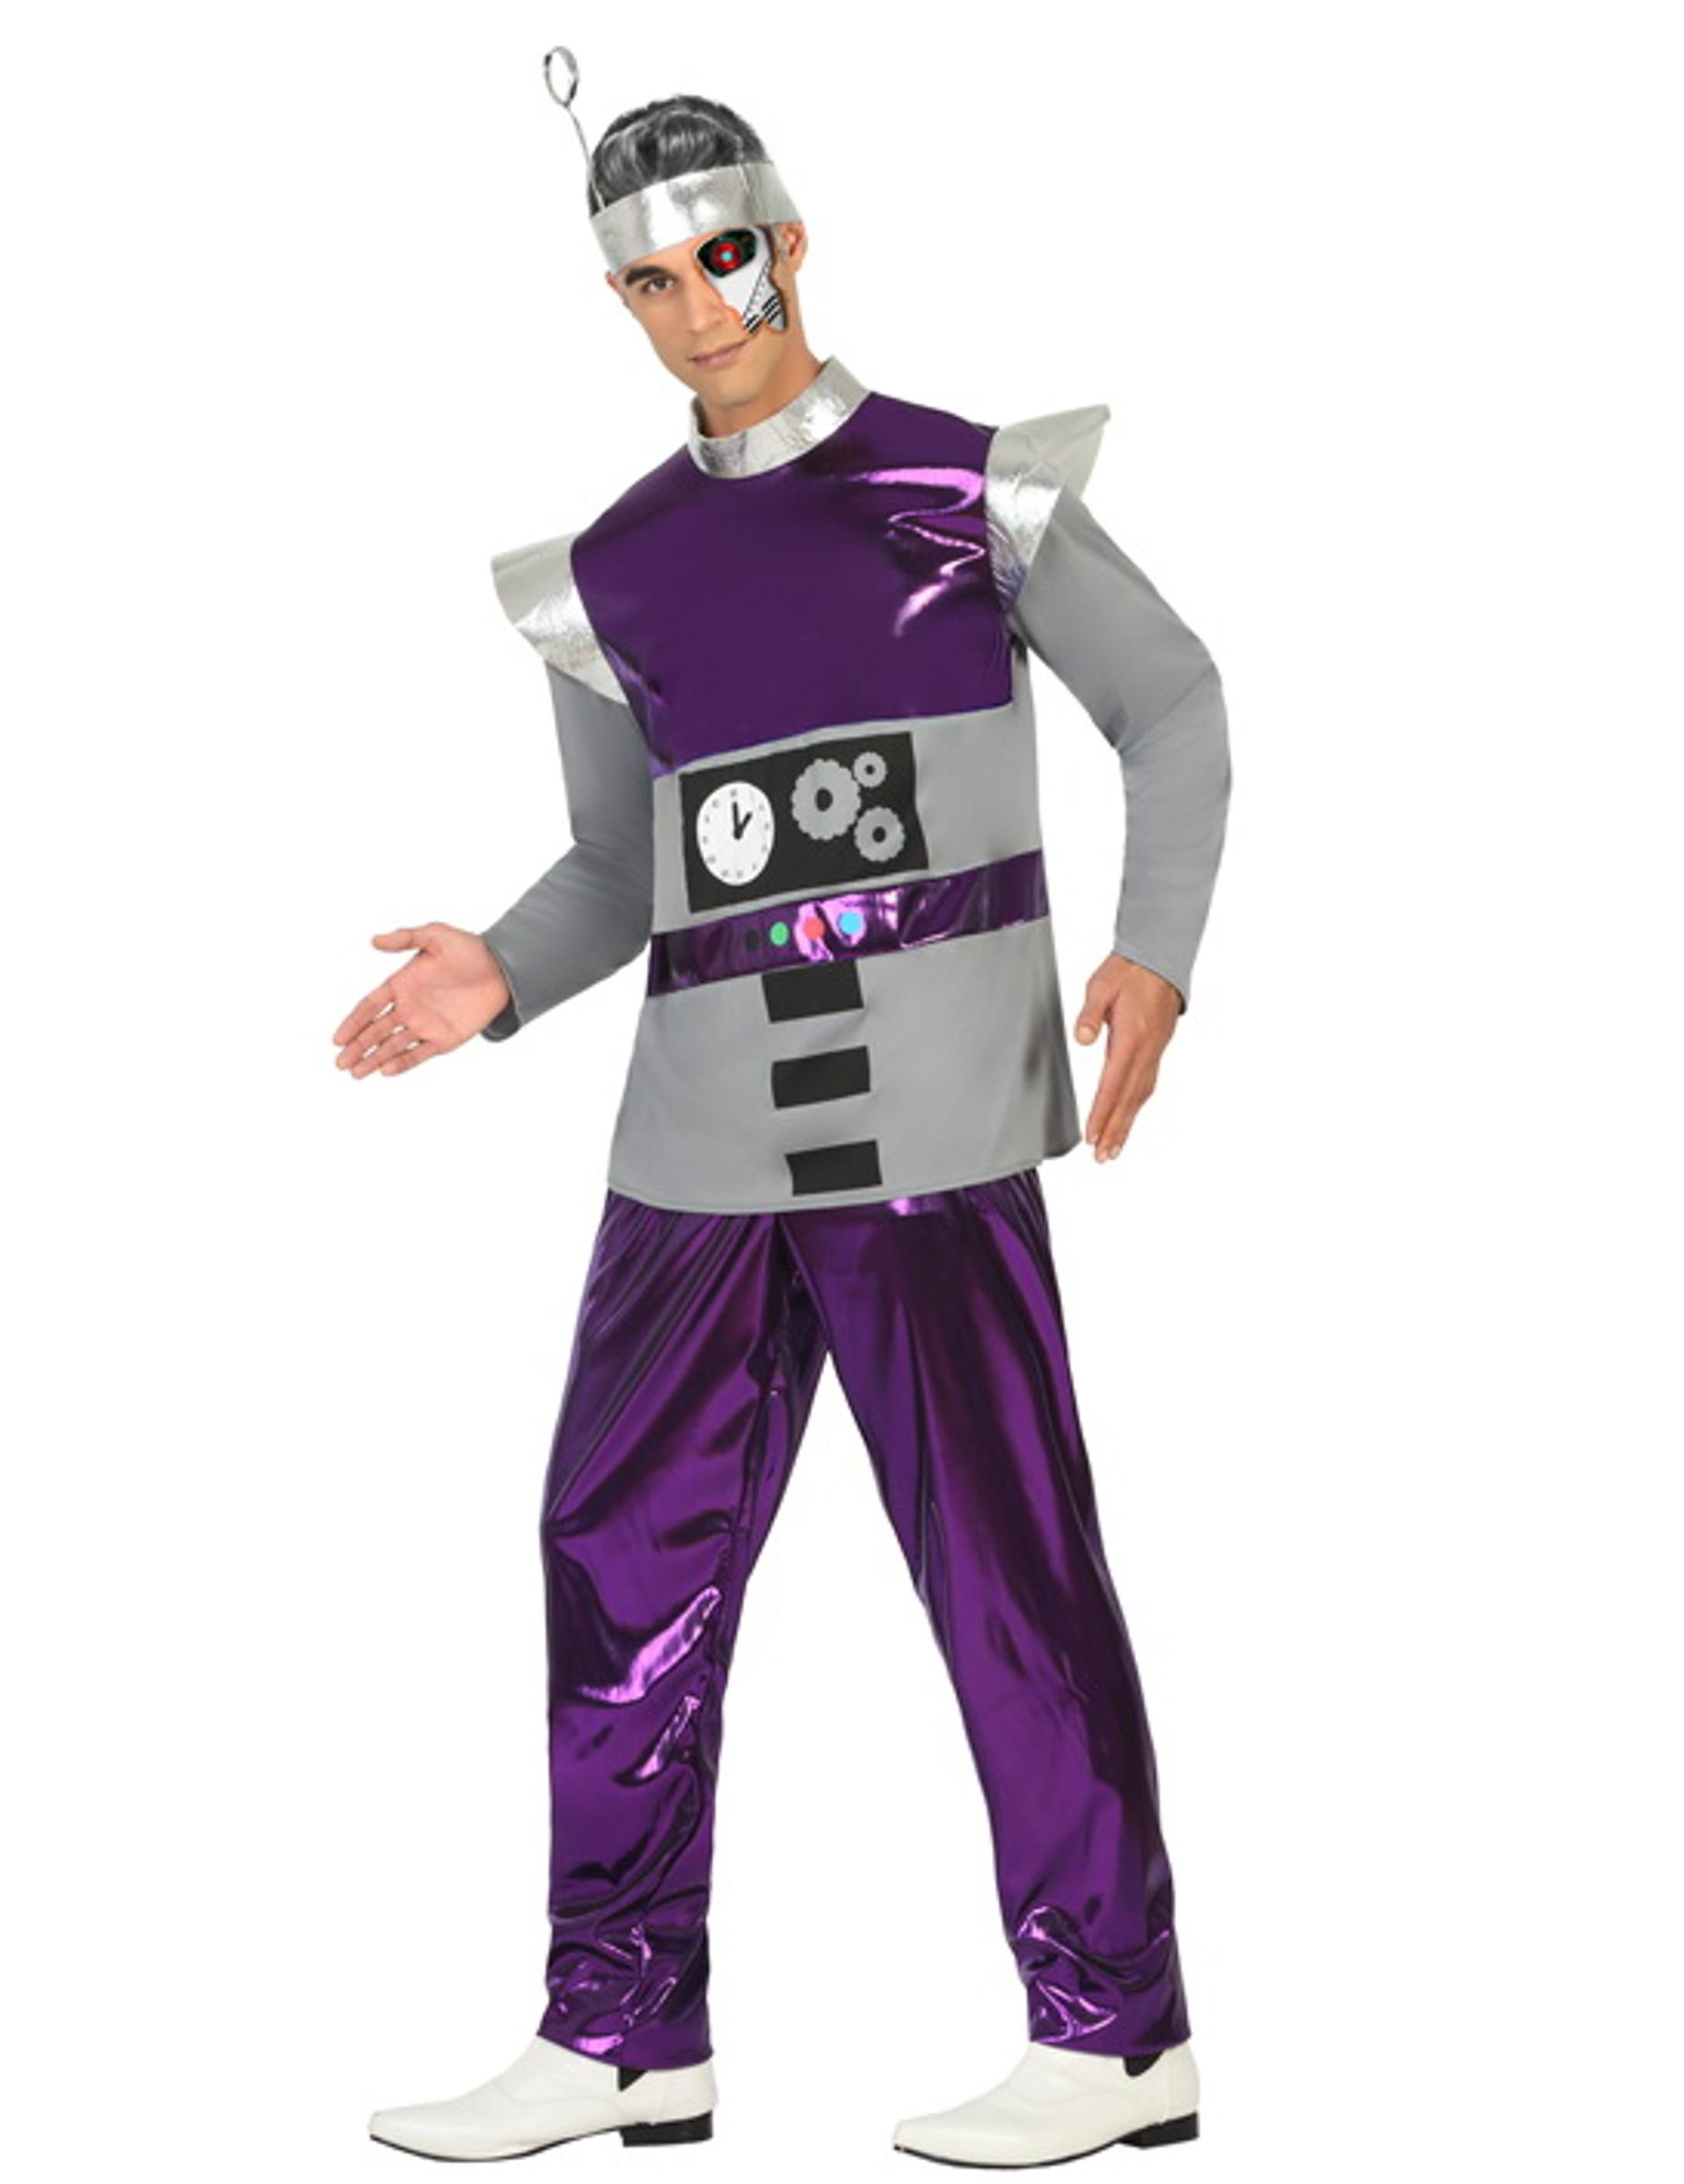 kost m roboter violett f r m nner kost me f r erwachsene und g nstige faschingskost me vegaoo. Black Bedroom Furniture Sets. Home Design Ideas